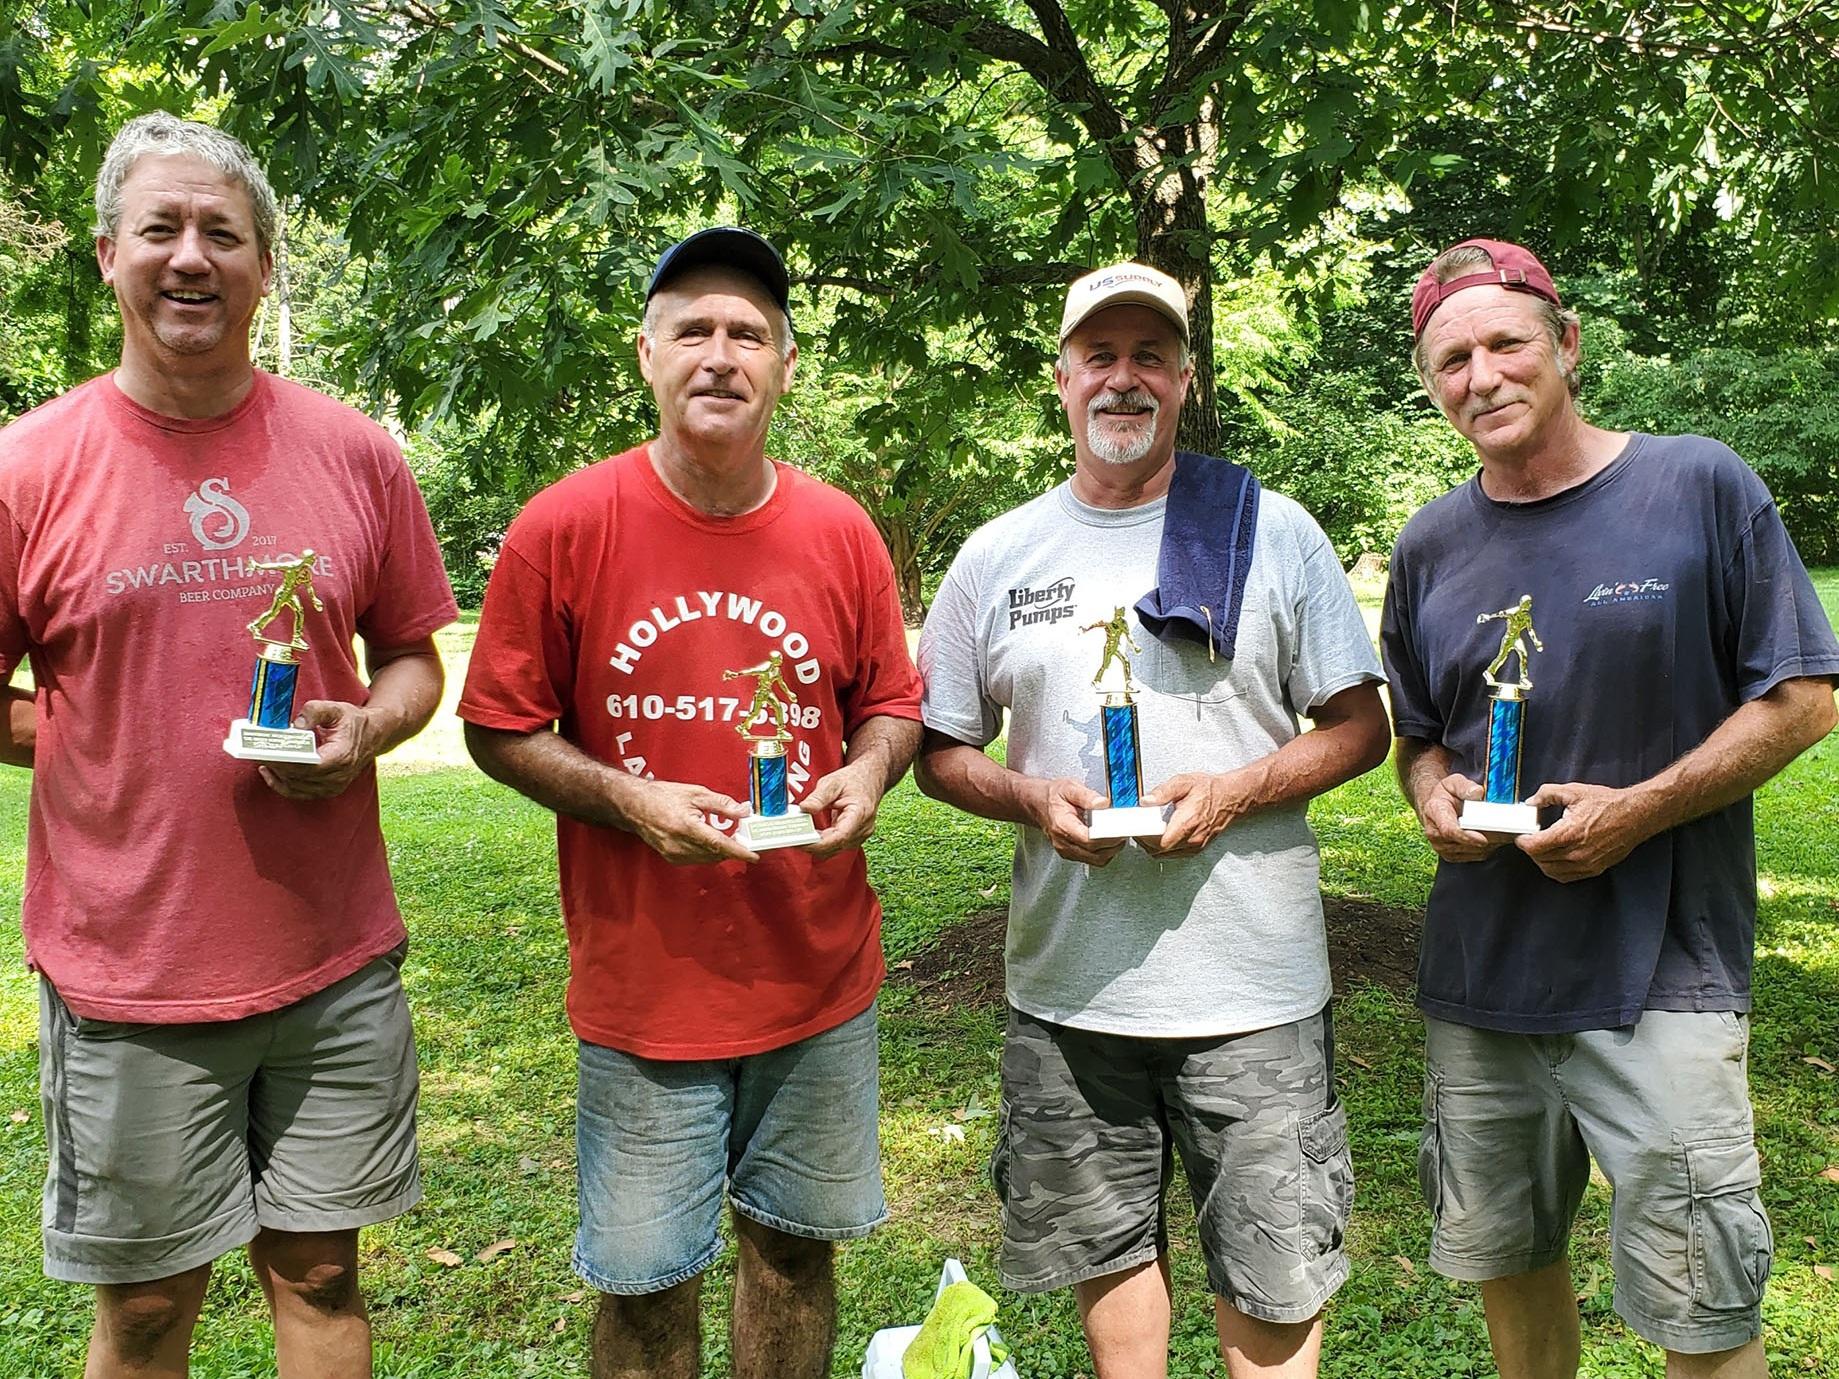 Swarthmore horseshoe contest winners